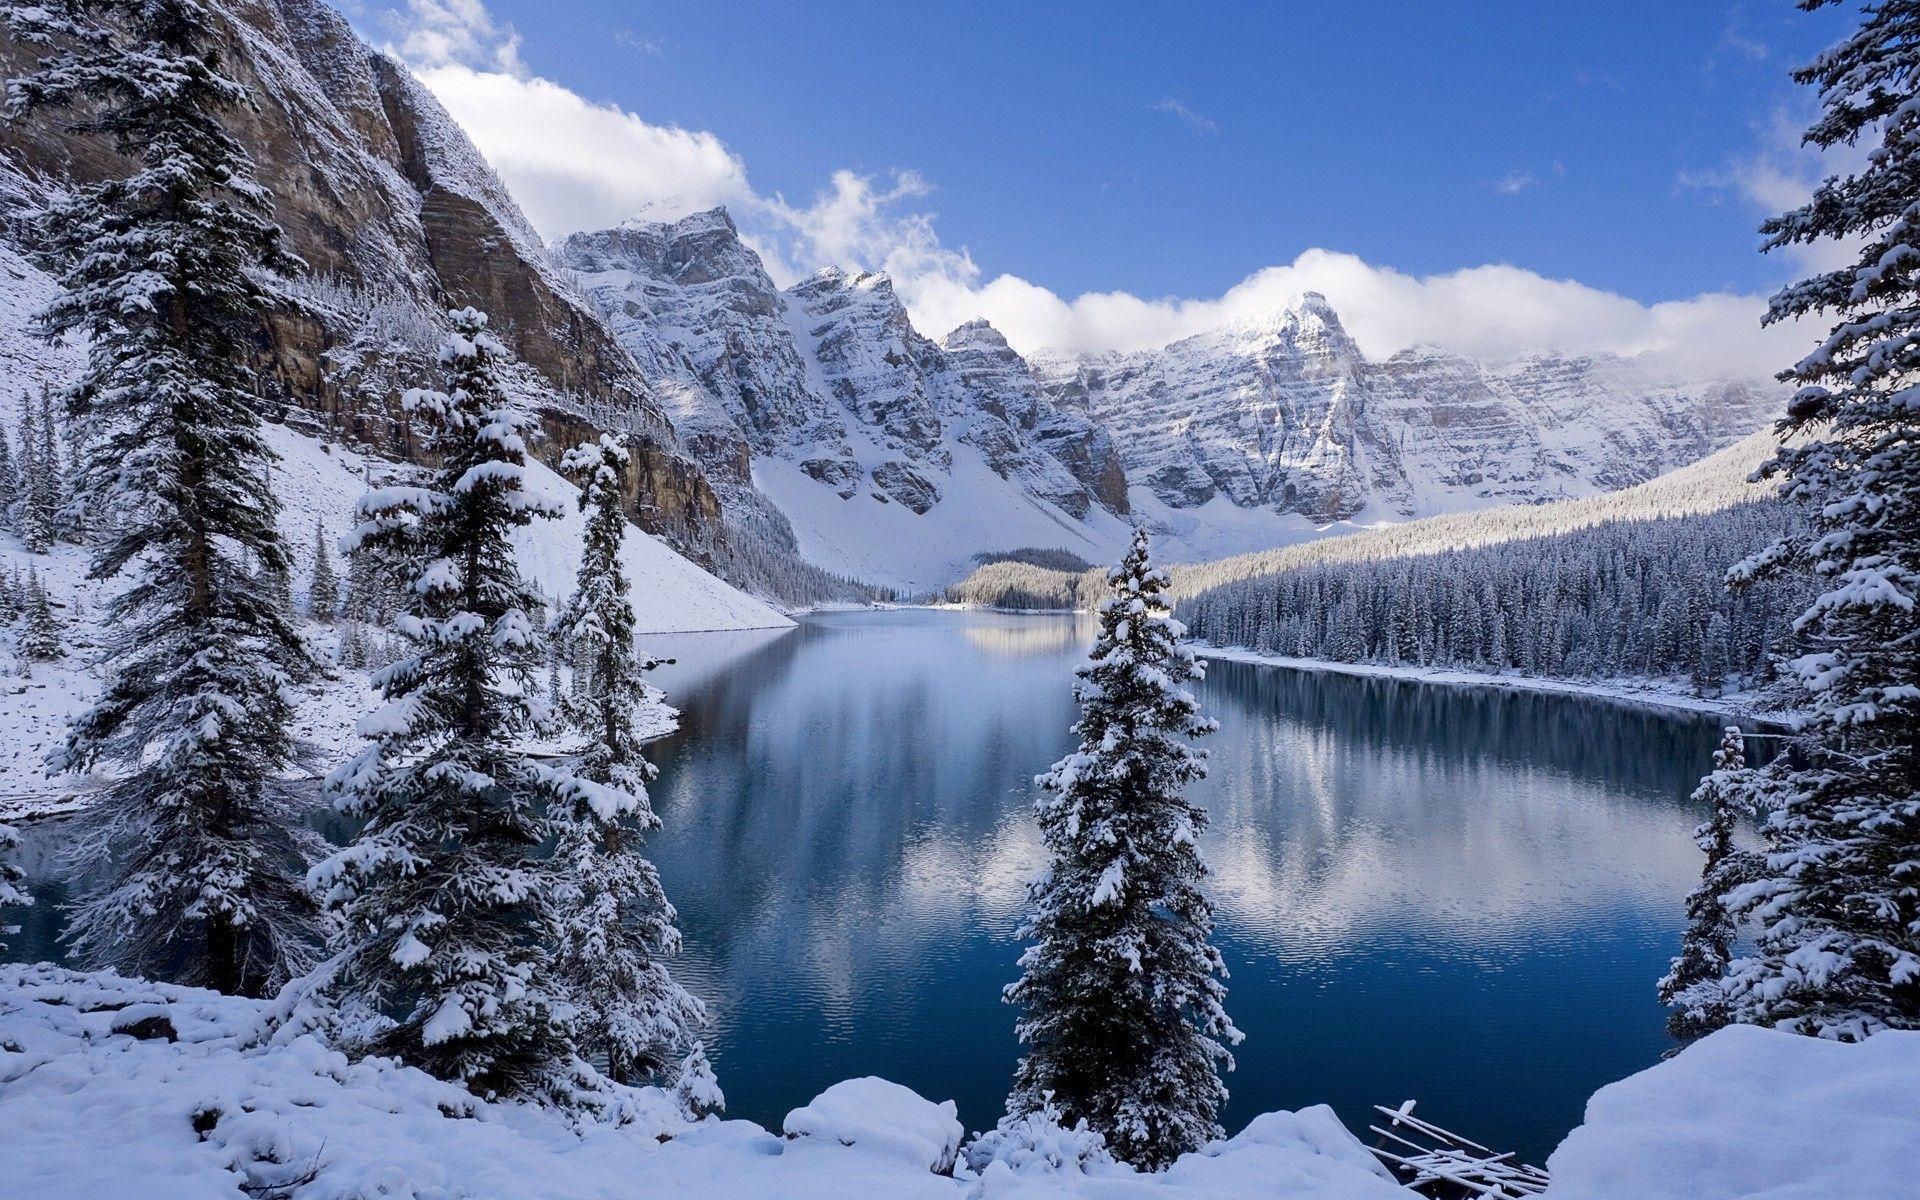 Snow Forest Google Kereses Winter Wallpaper Hd Winter Landscape Landscape Wallpaper